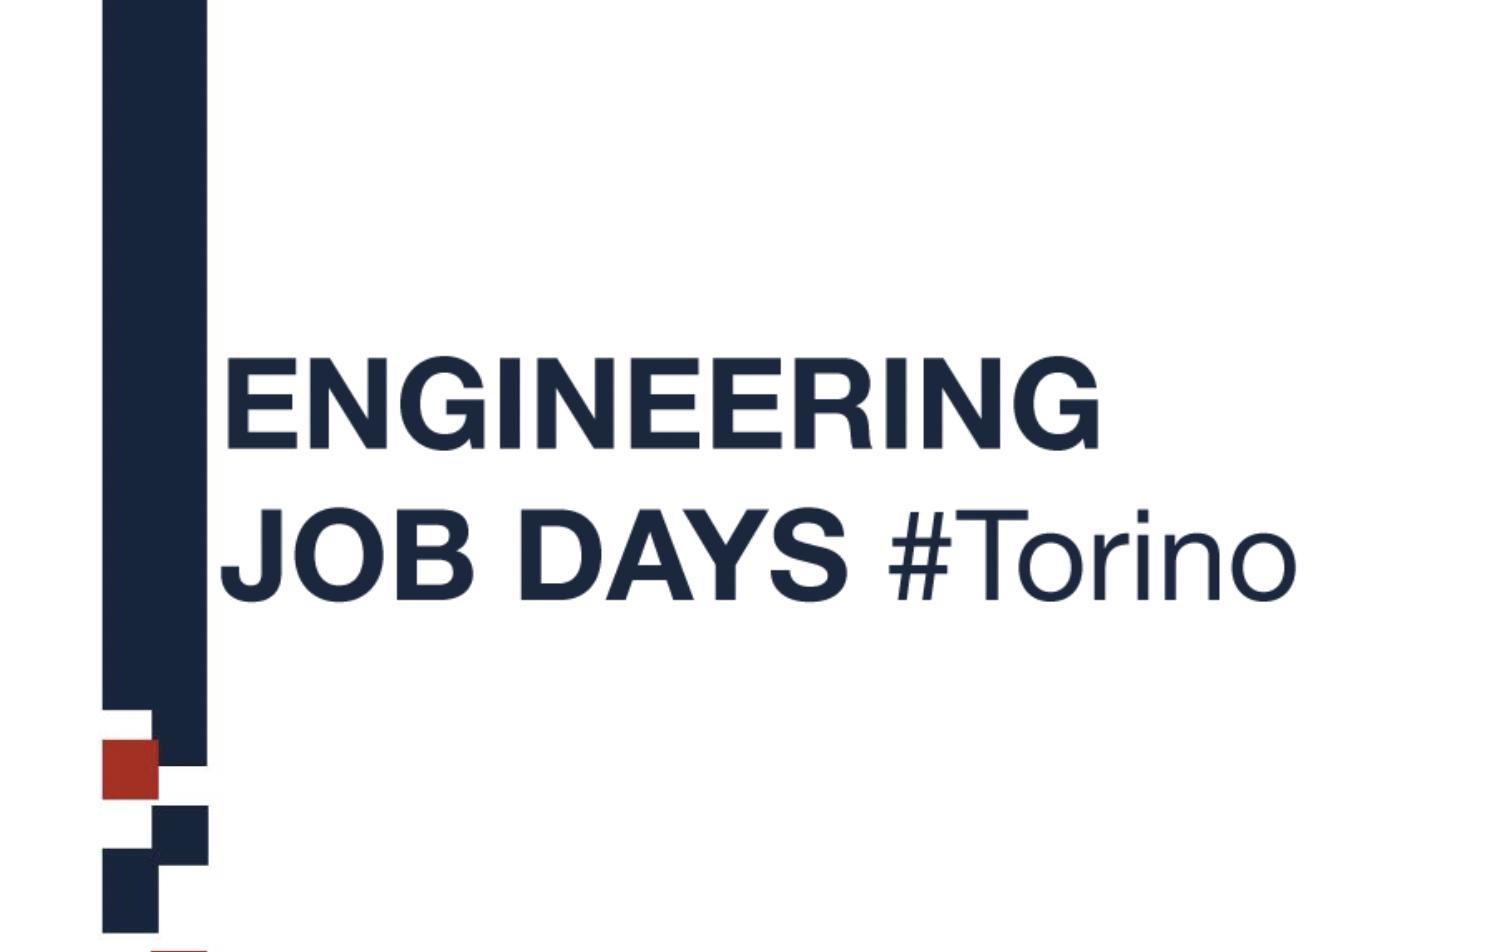 Engineering job days,